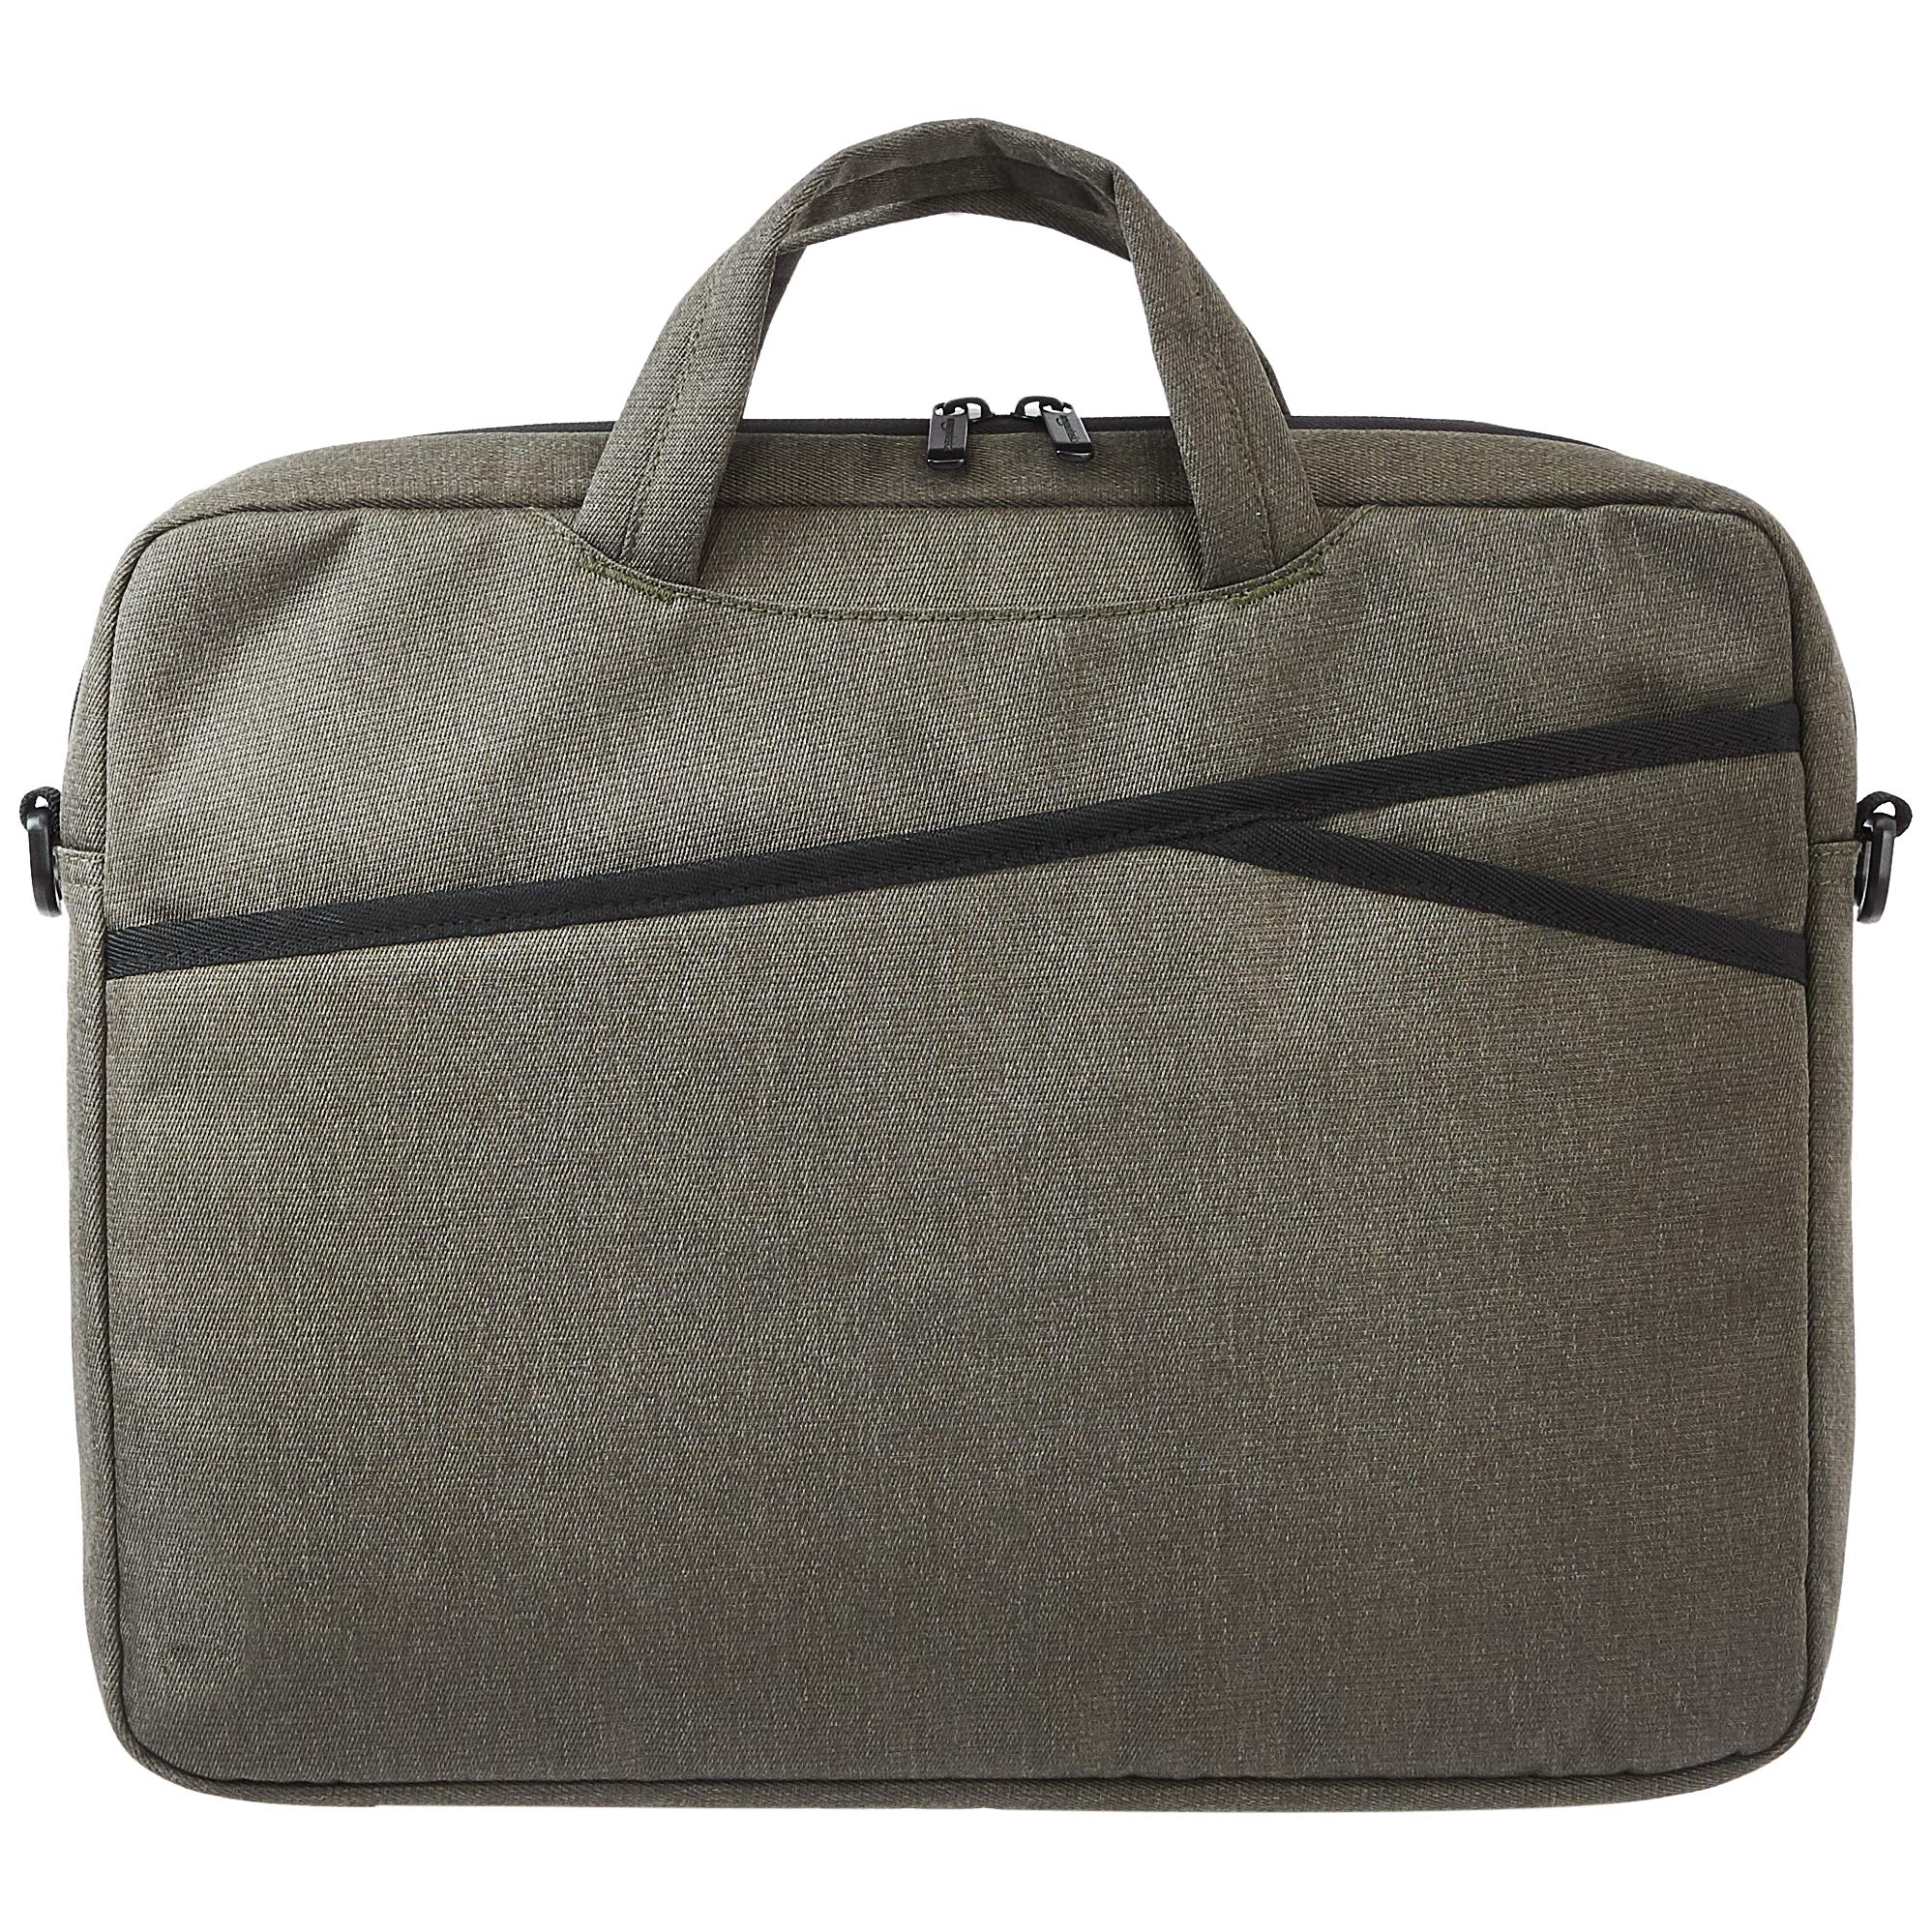 Amazon Basics Business Laptop Case Bag - 15-Inch, Army Green